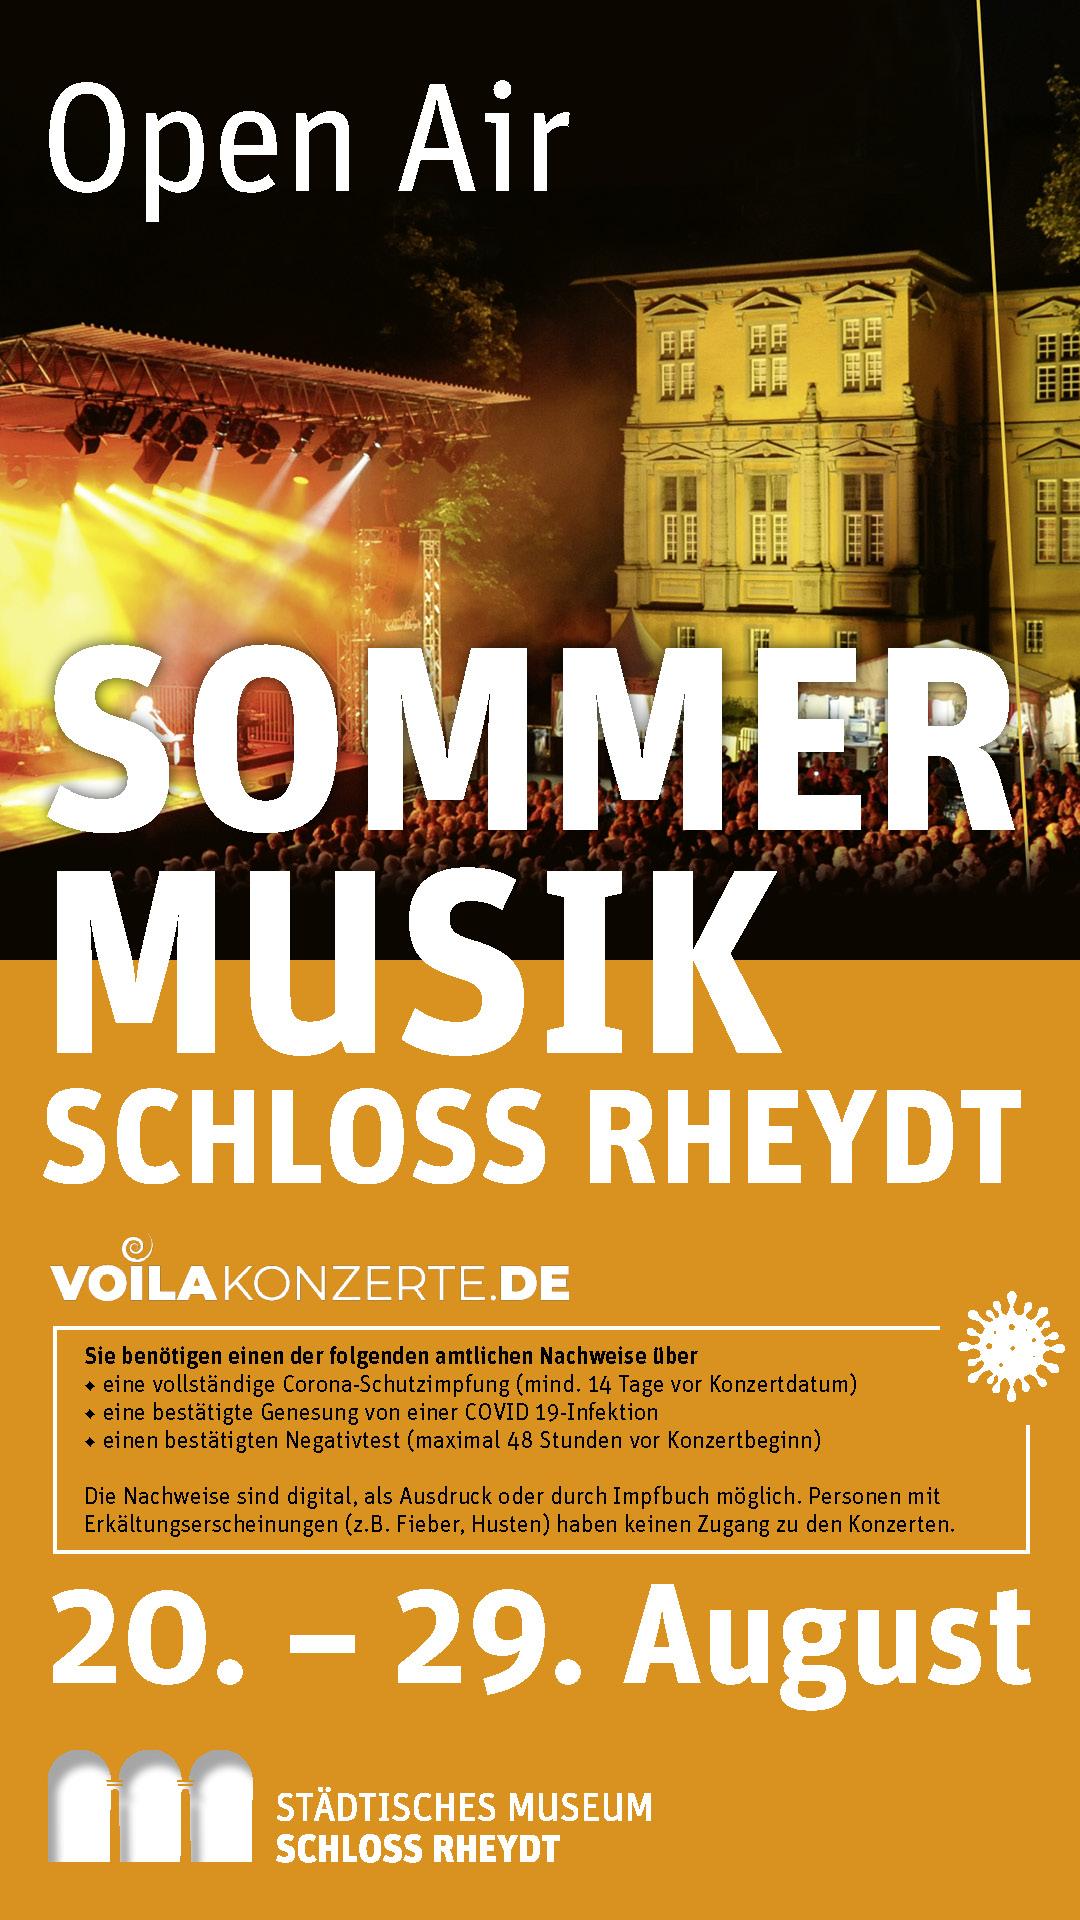 Sommermusik Schloss Rheydt